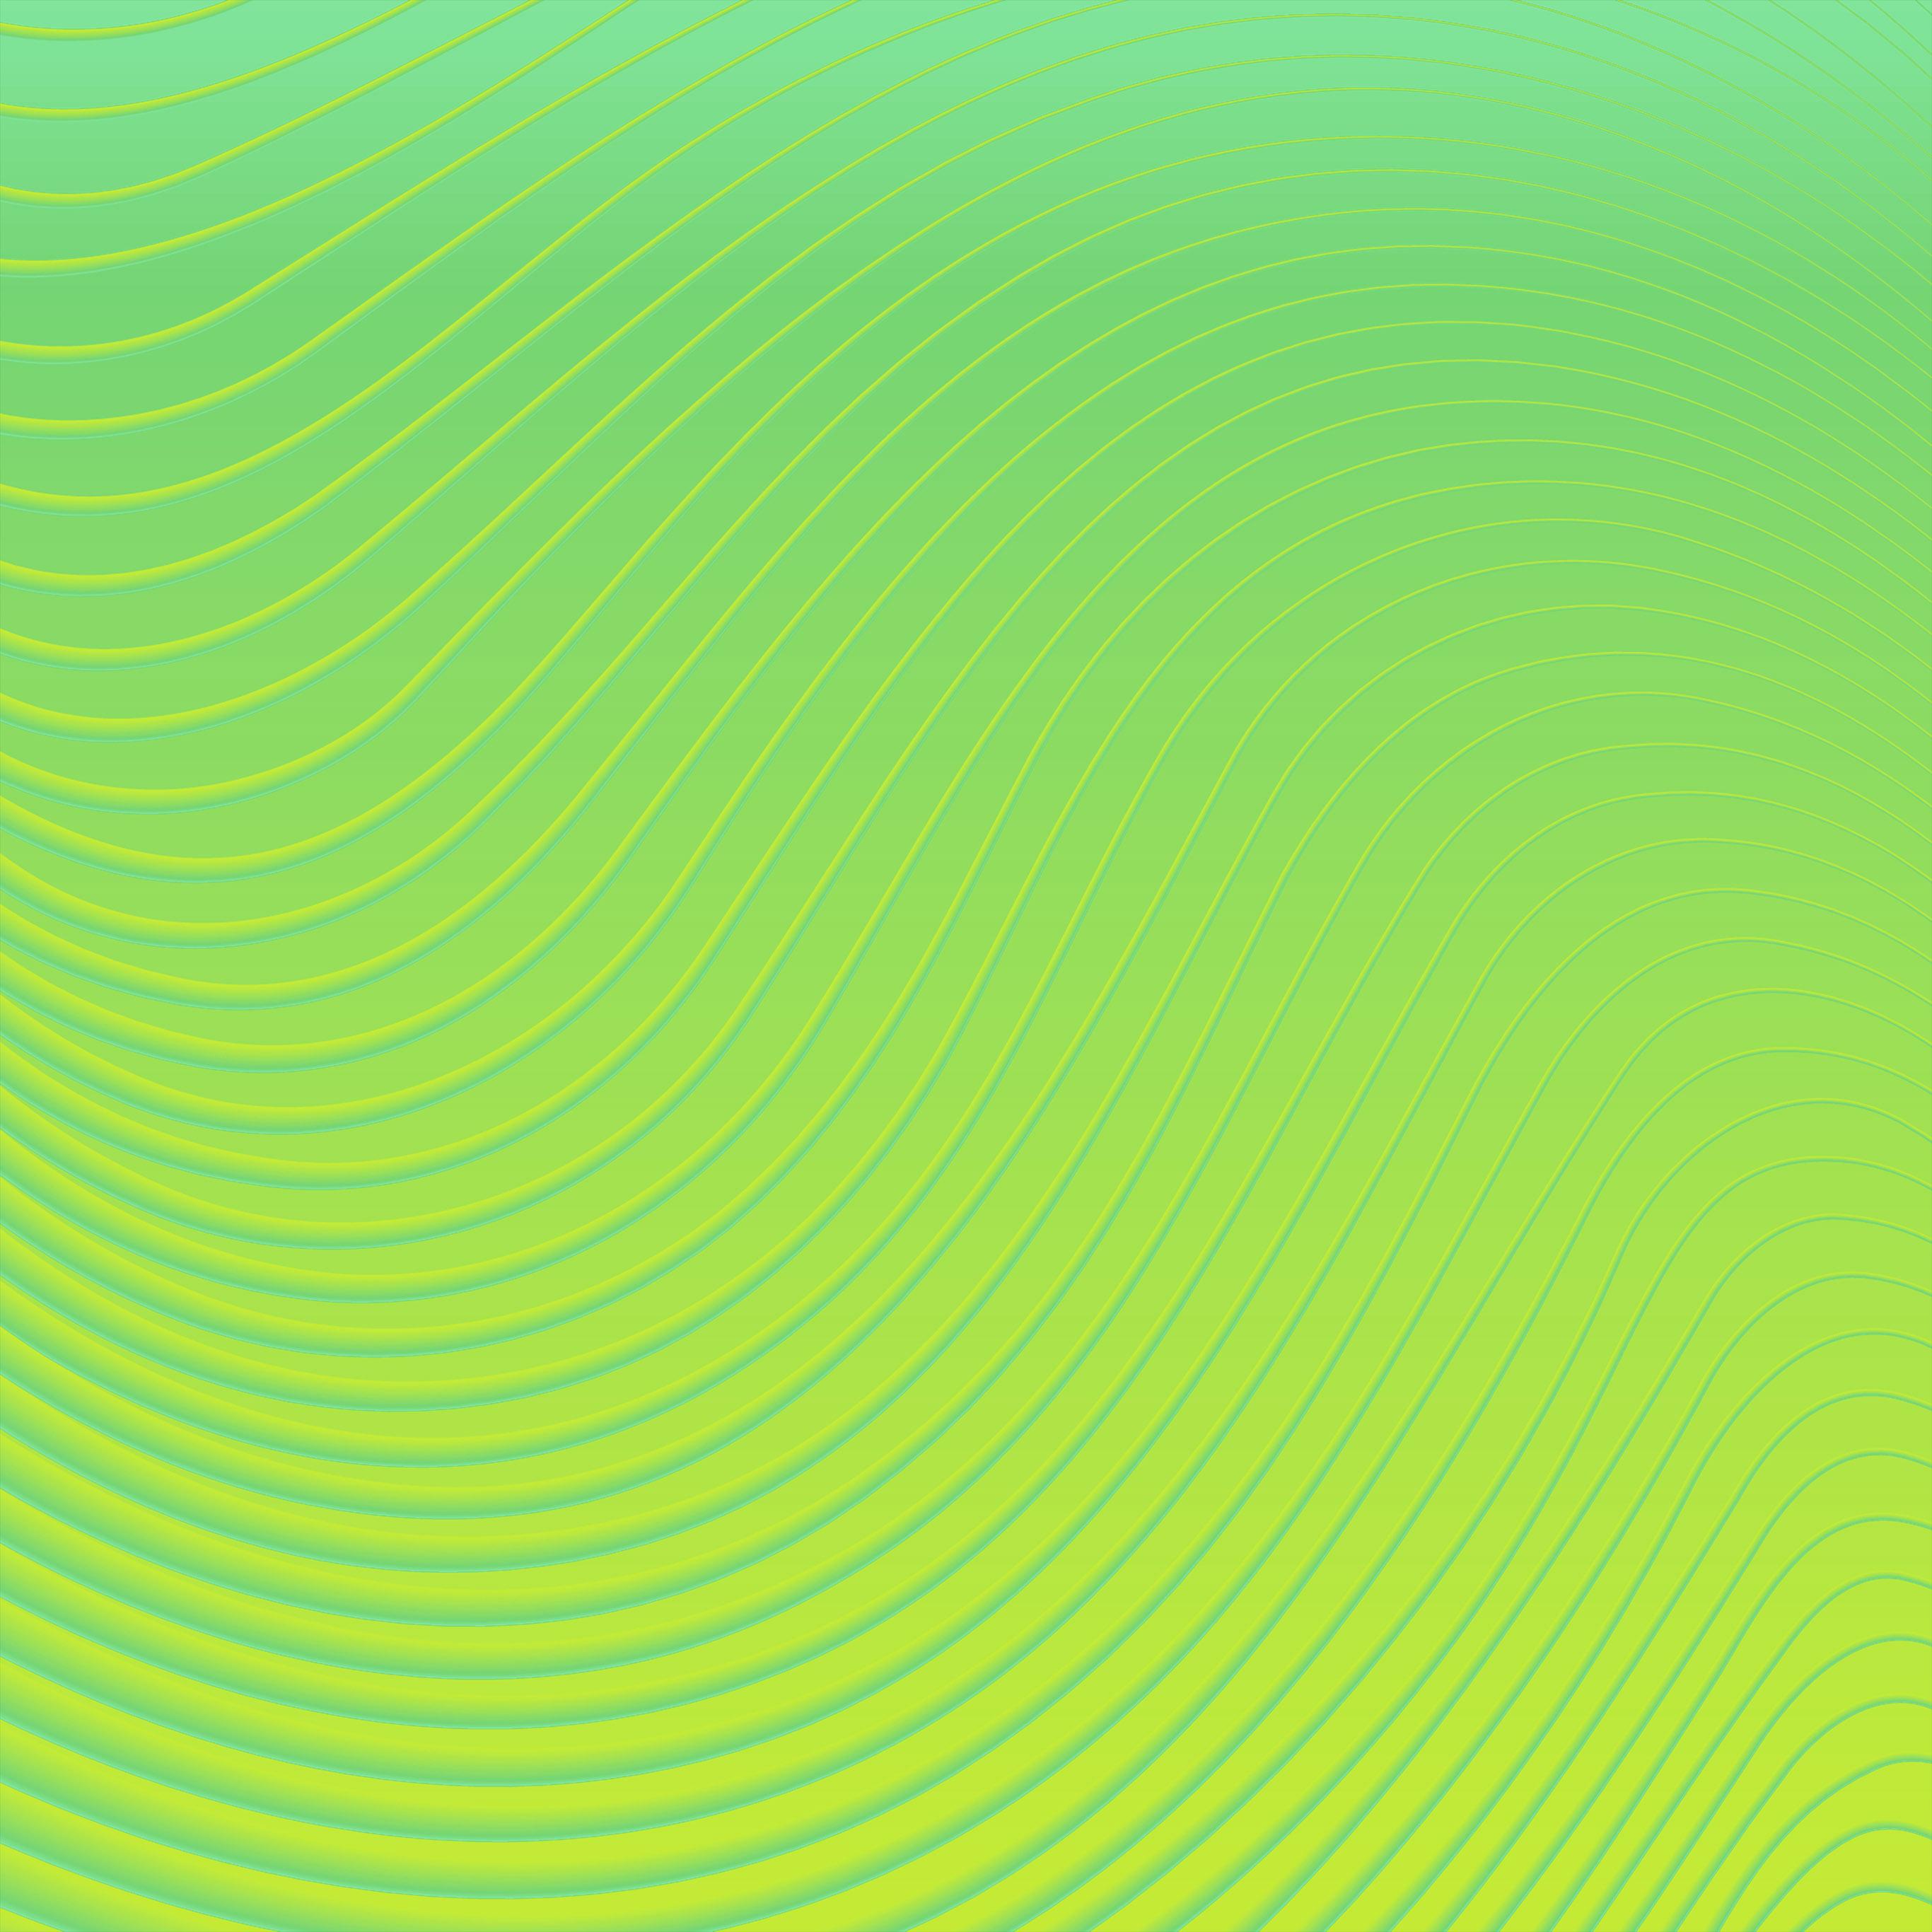 Vp12 Curve Green Yellow Pattern Wallpaper